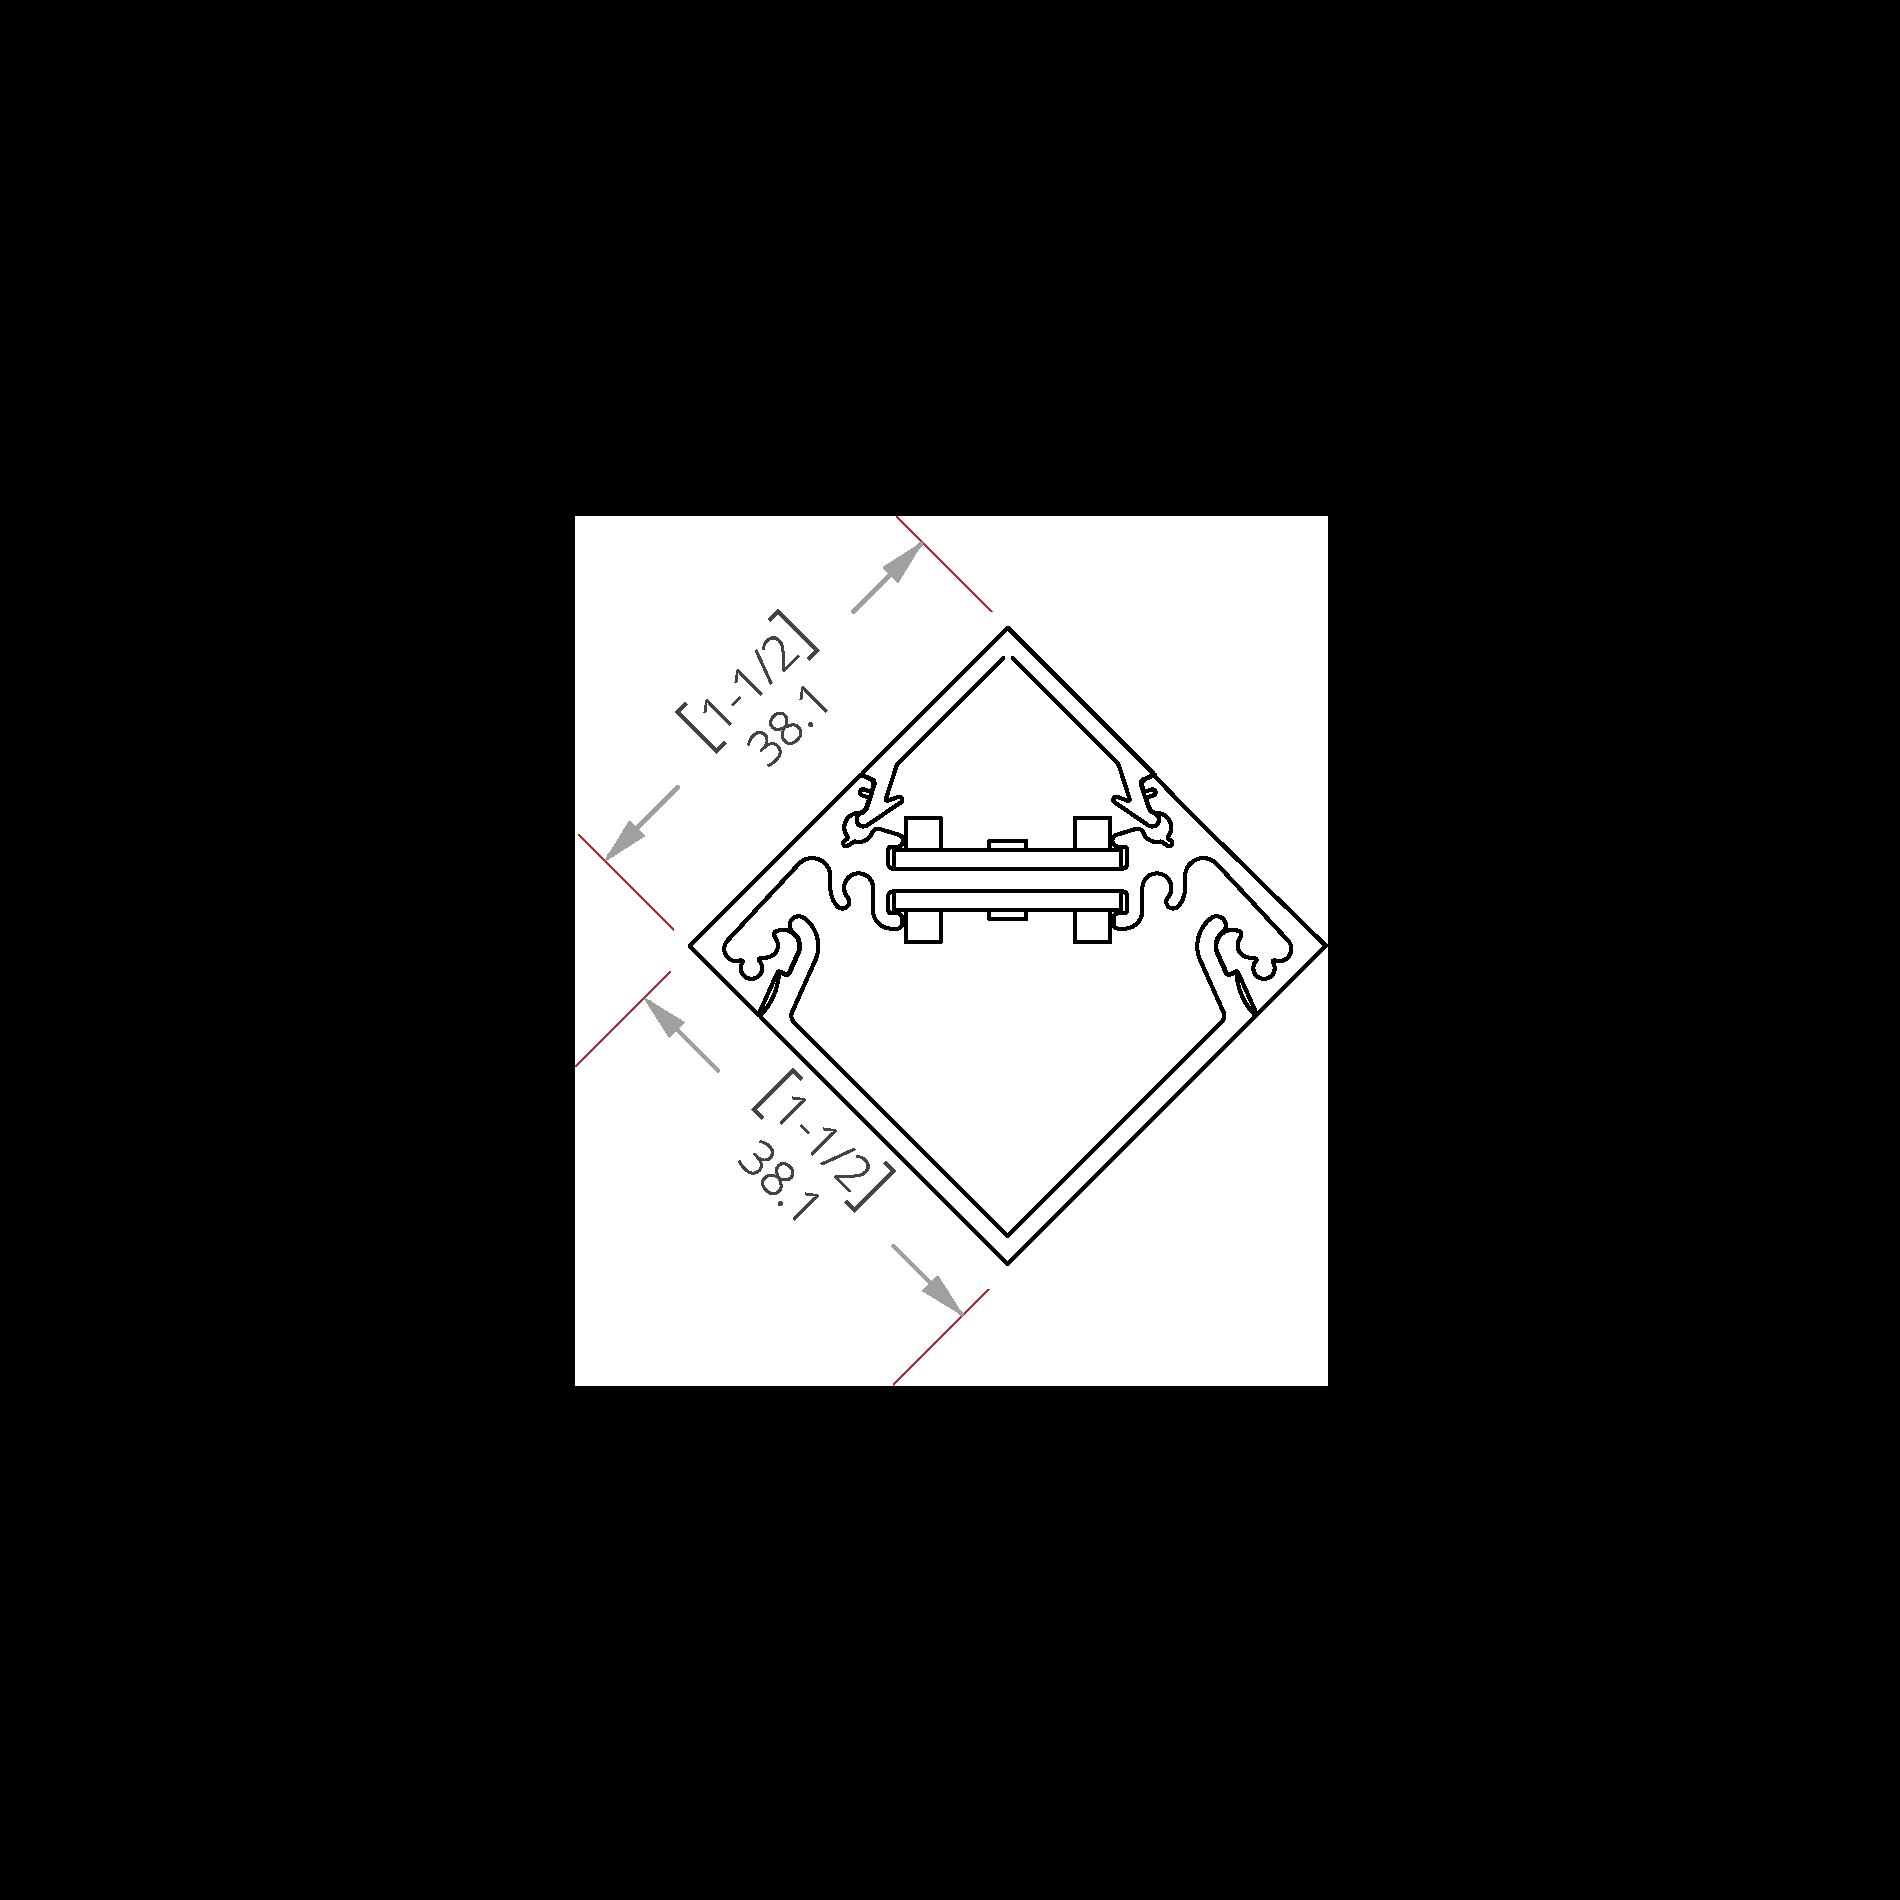 Neutron Line Drawing